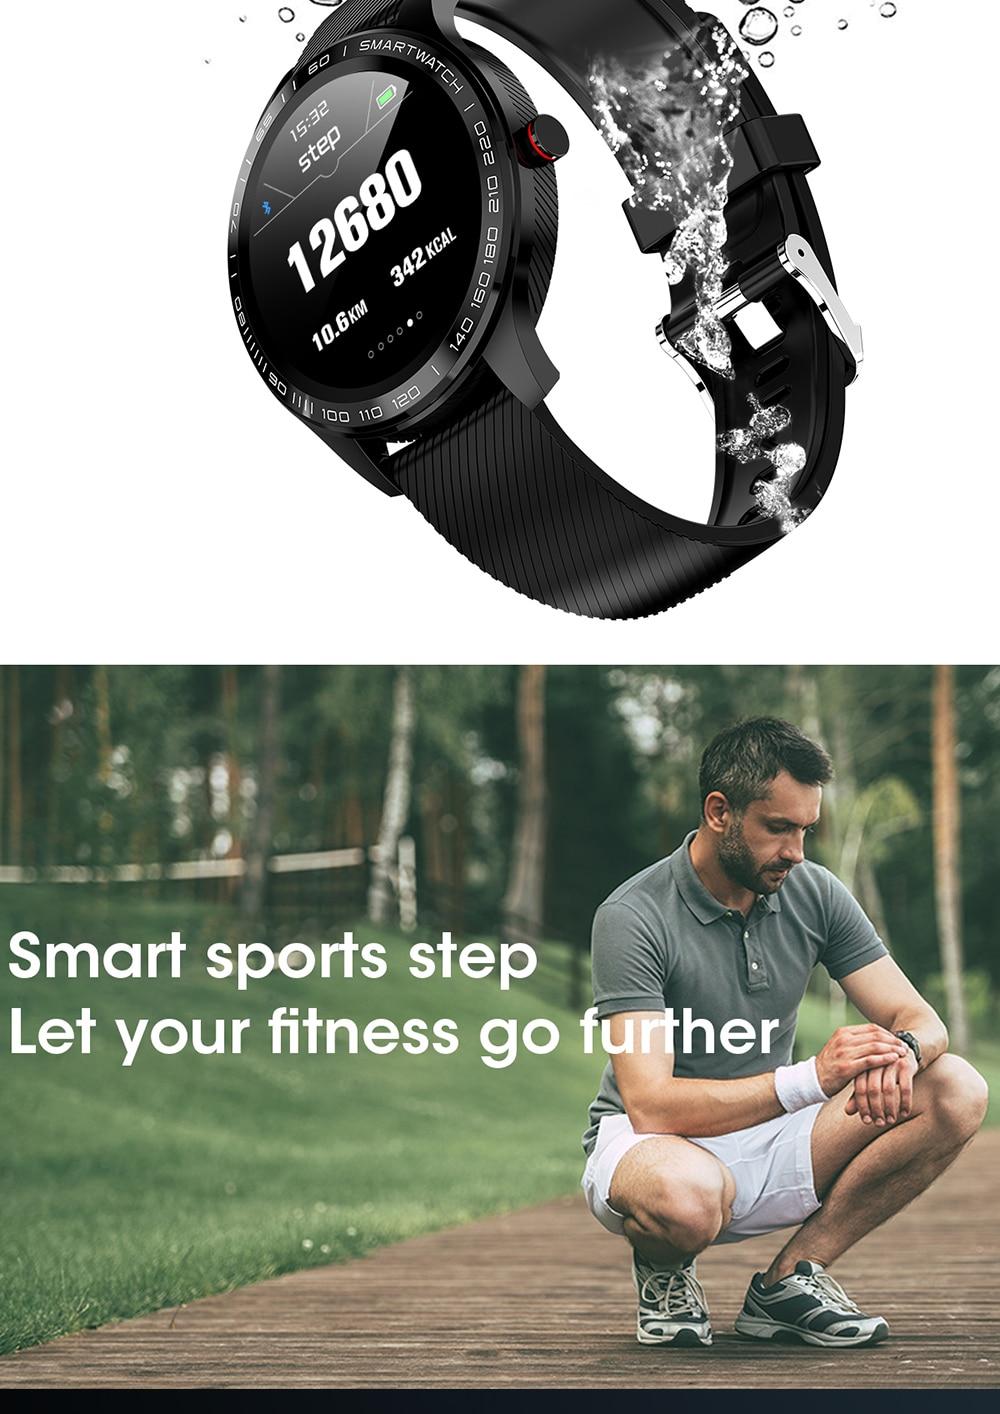 H3f568b7001034fc2920679c5f8889986U 696 L9 Full touch Smart Watch Men ECG+PPG Heart Rate Blood Pressure oxygen Monitor IP68 Waterproof Bluetooth Smart Bracelet